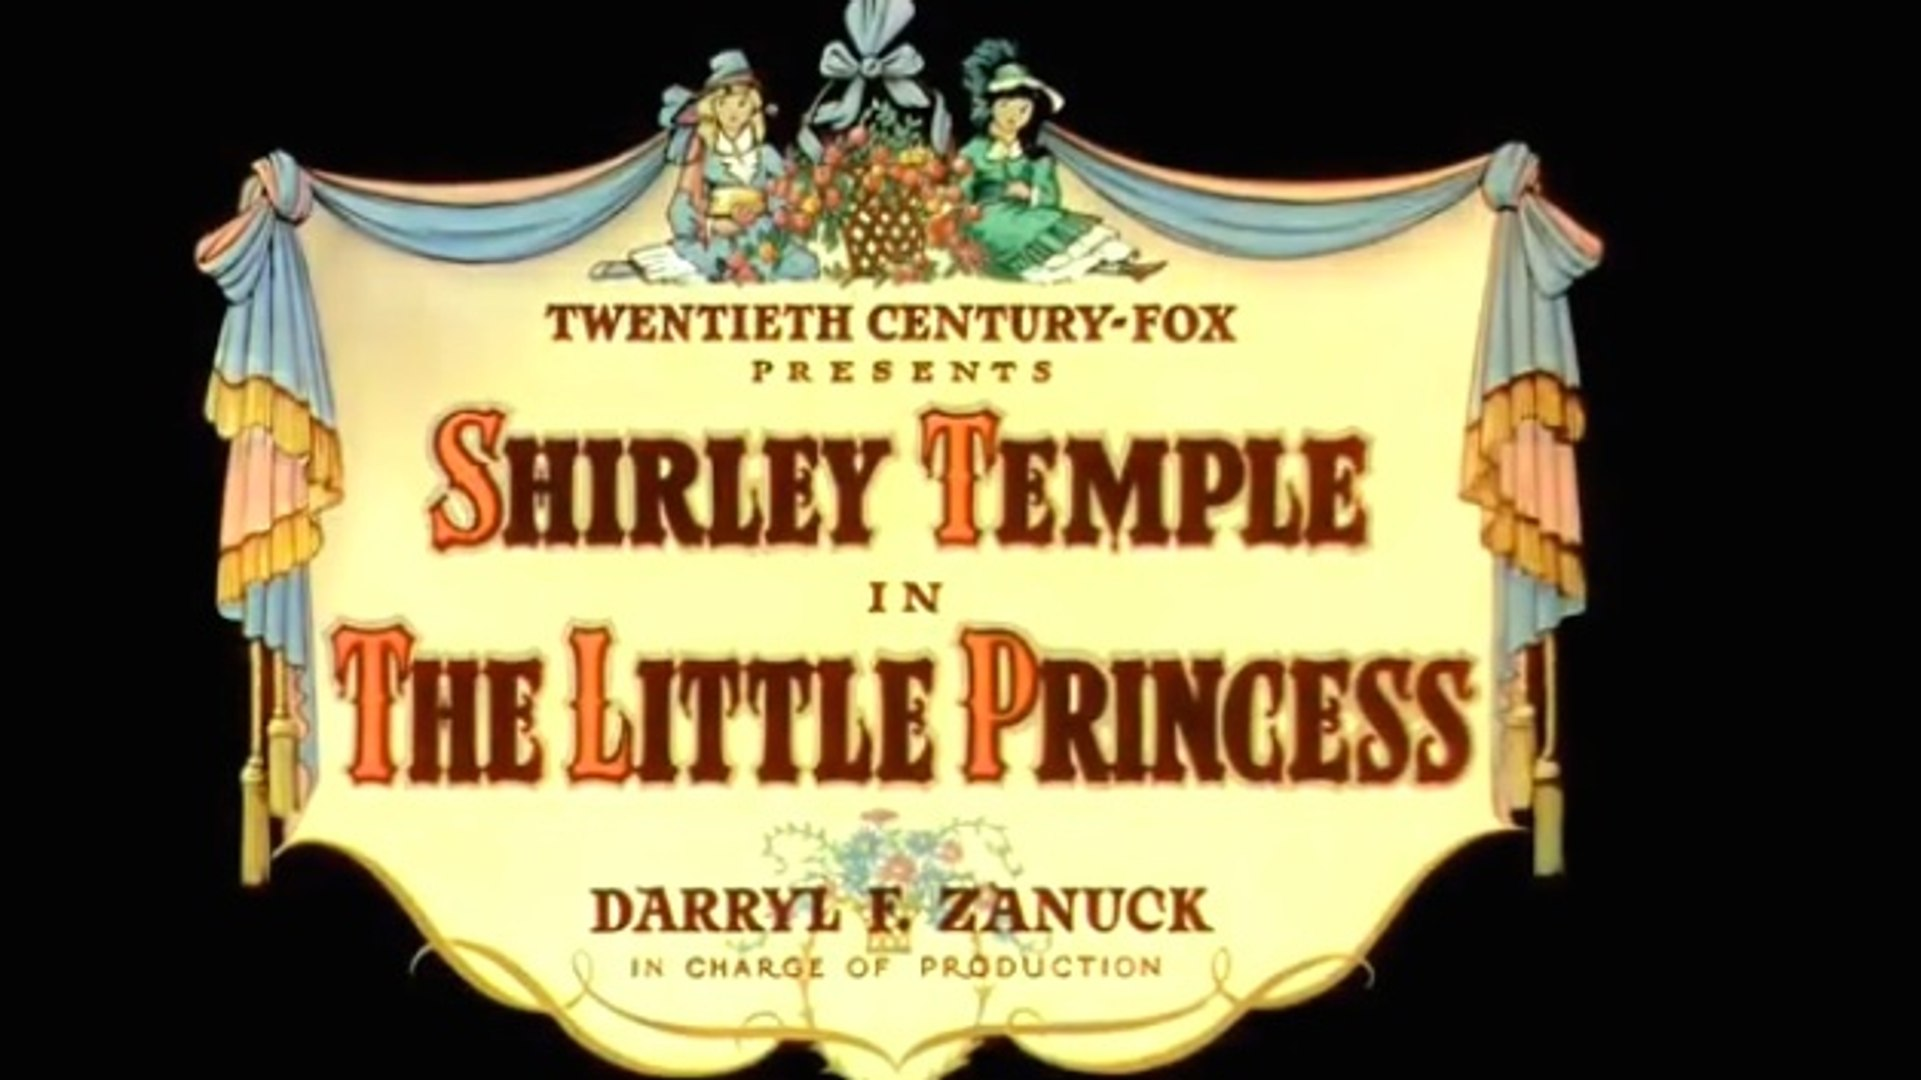 The Little Princess (1939) Shirley Temple, Richard Greene, Anita Louise.  Comedy | Drama | Family